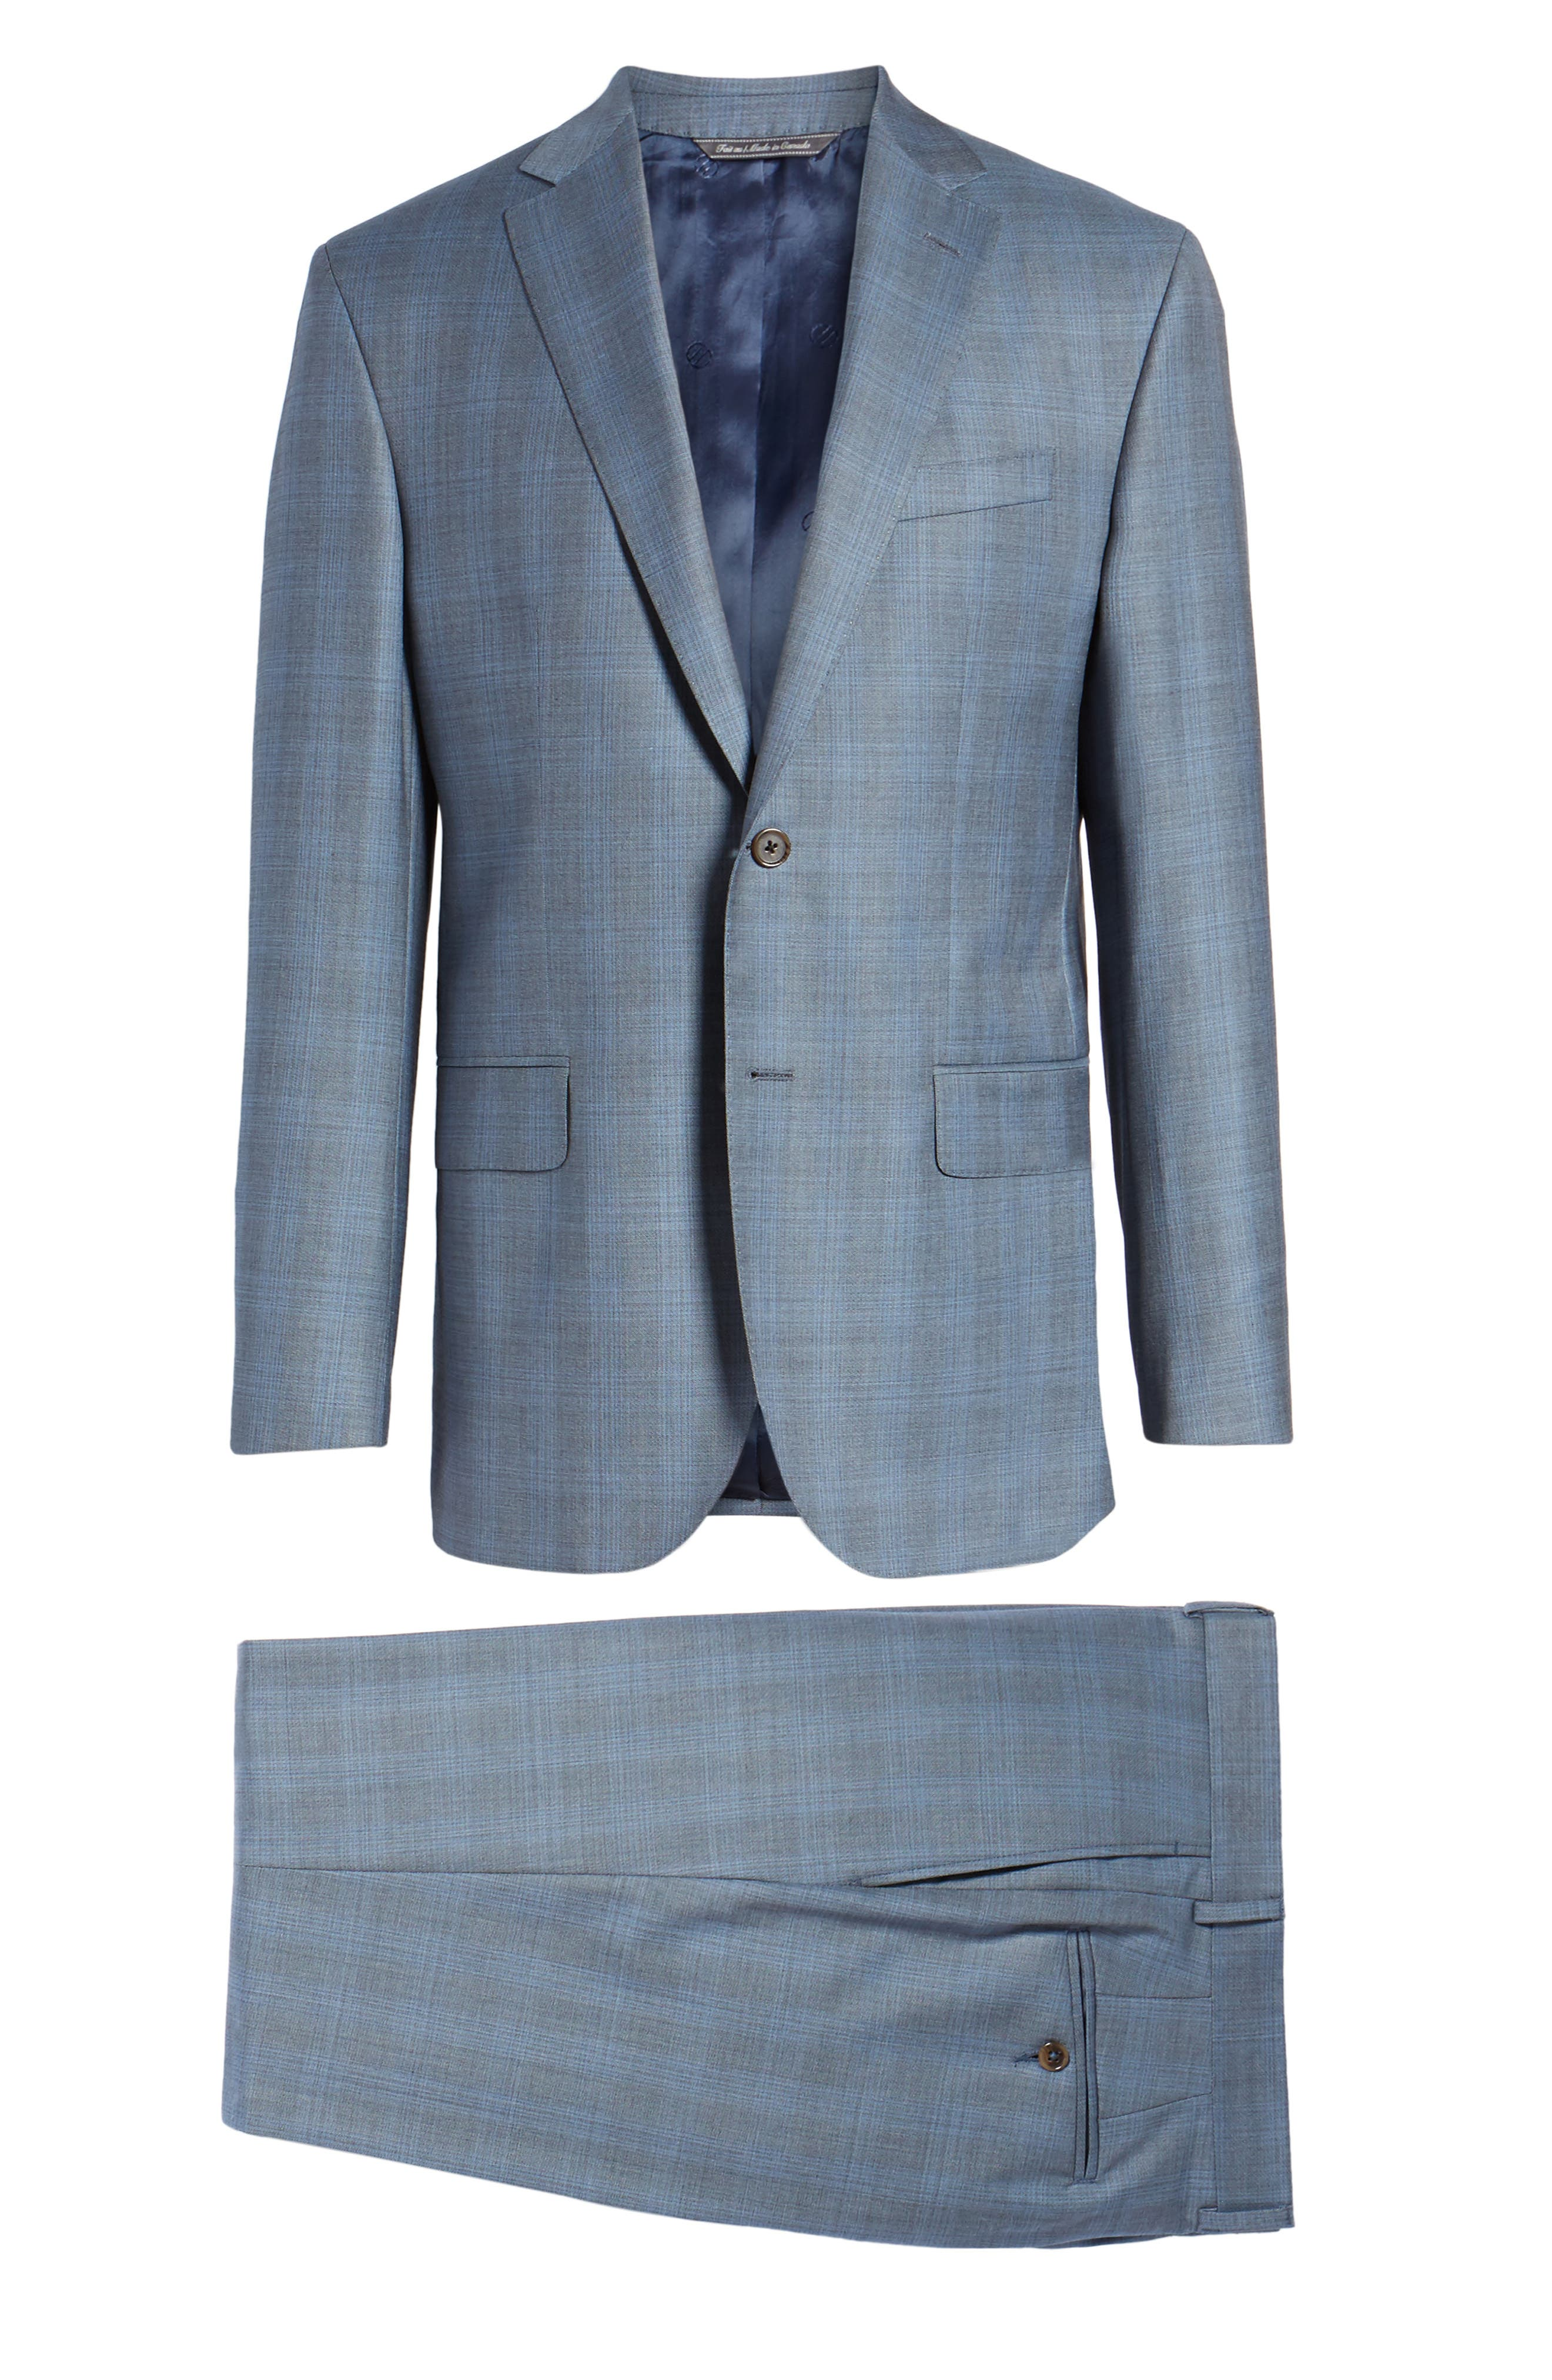 Ryan Classic Fit Plaid Wool Suit,                             Alternate thumbnail 8, color,                             020